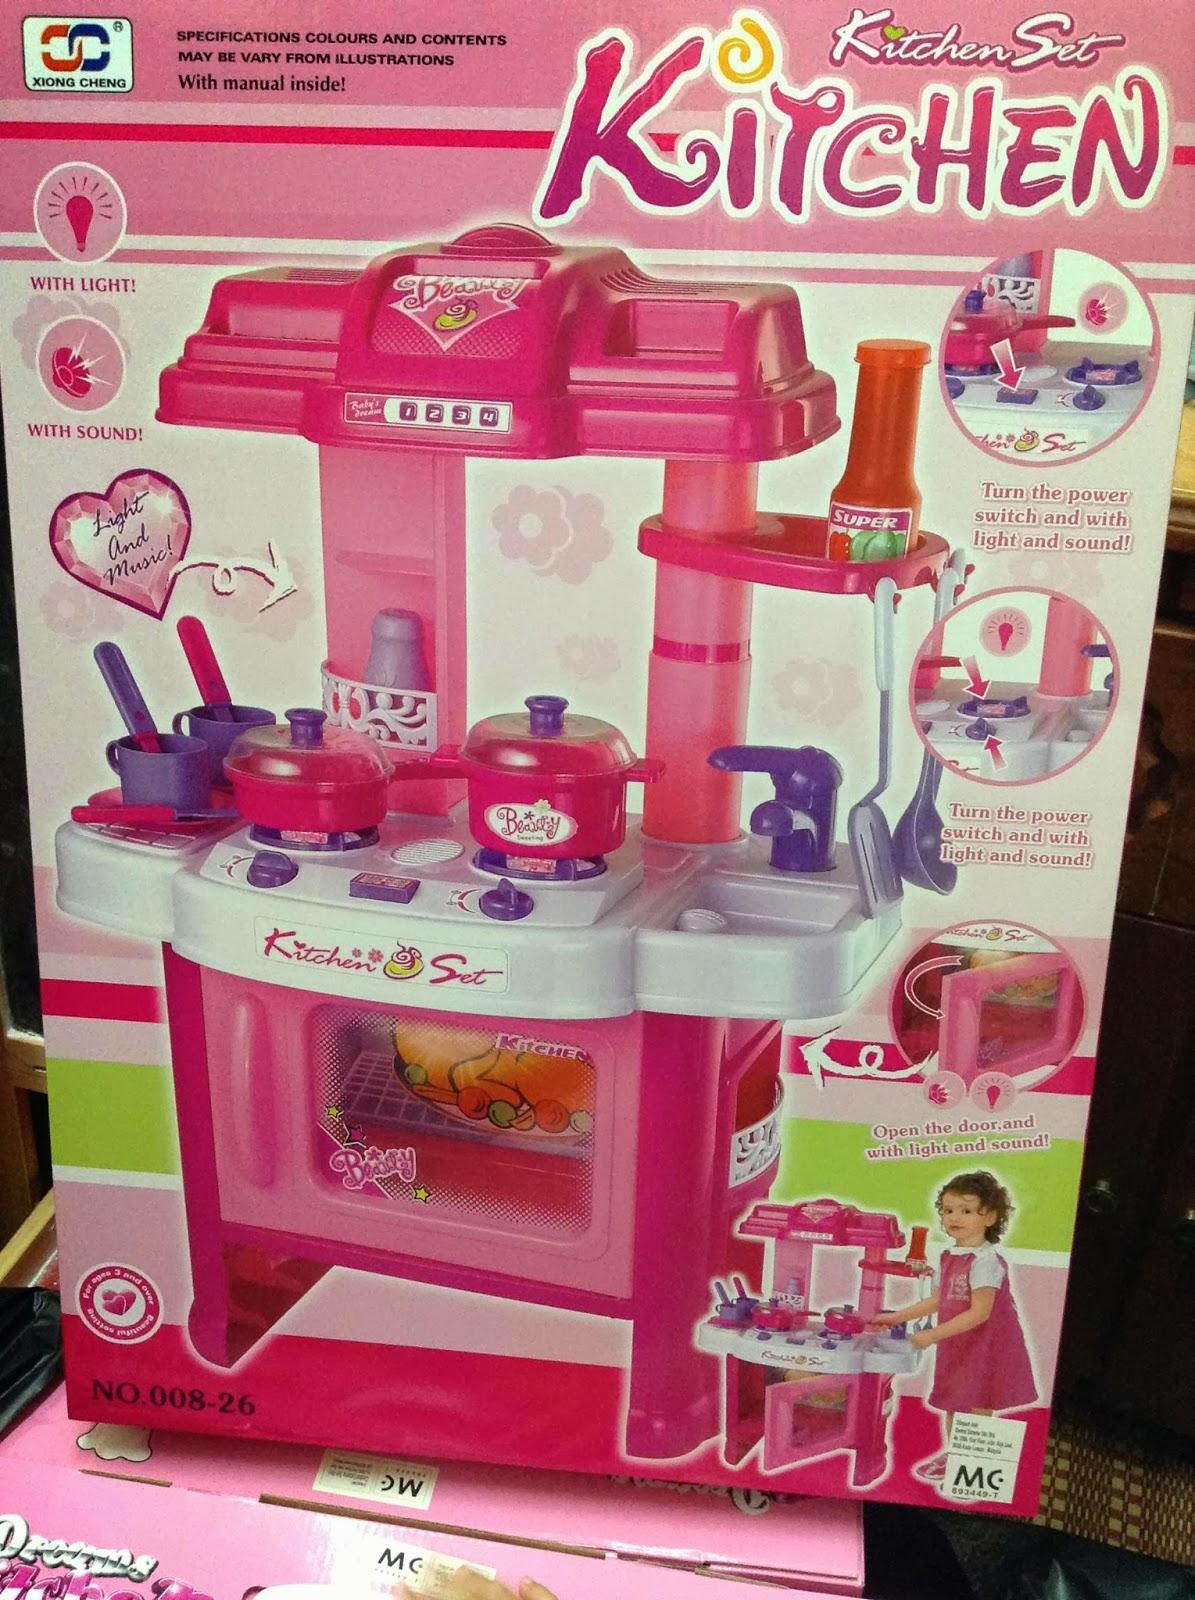 Speak without voice kitchen playset murah dan borong for Kitchen set 008 26